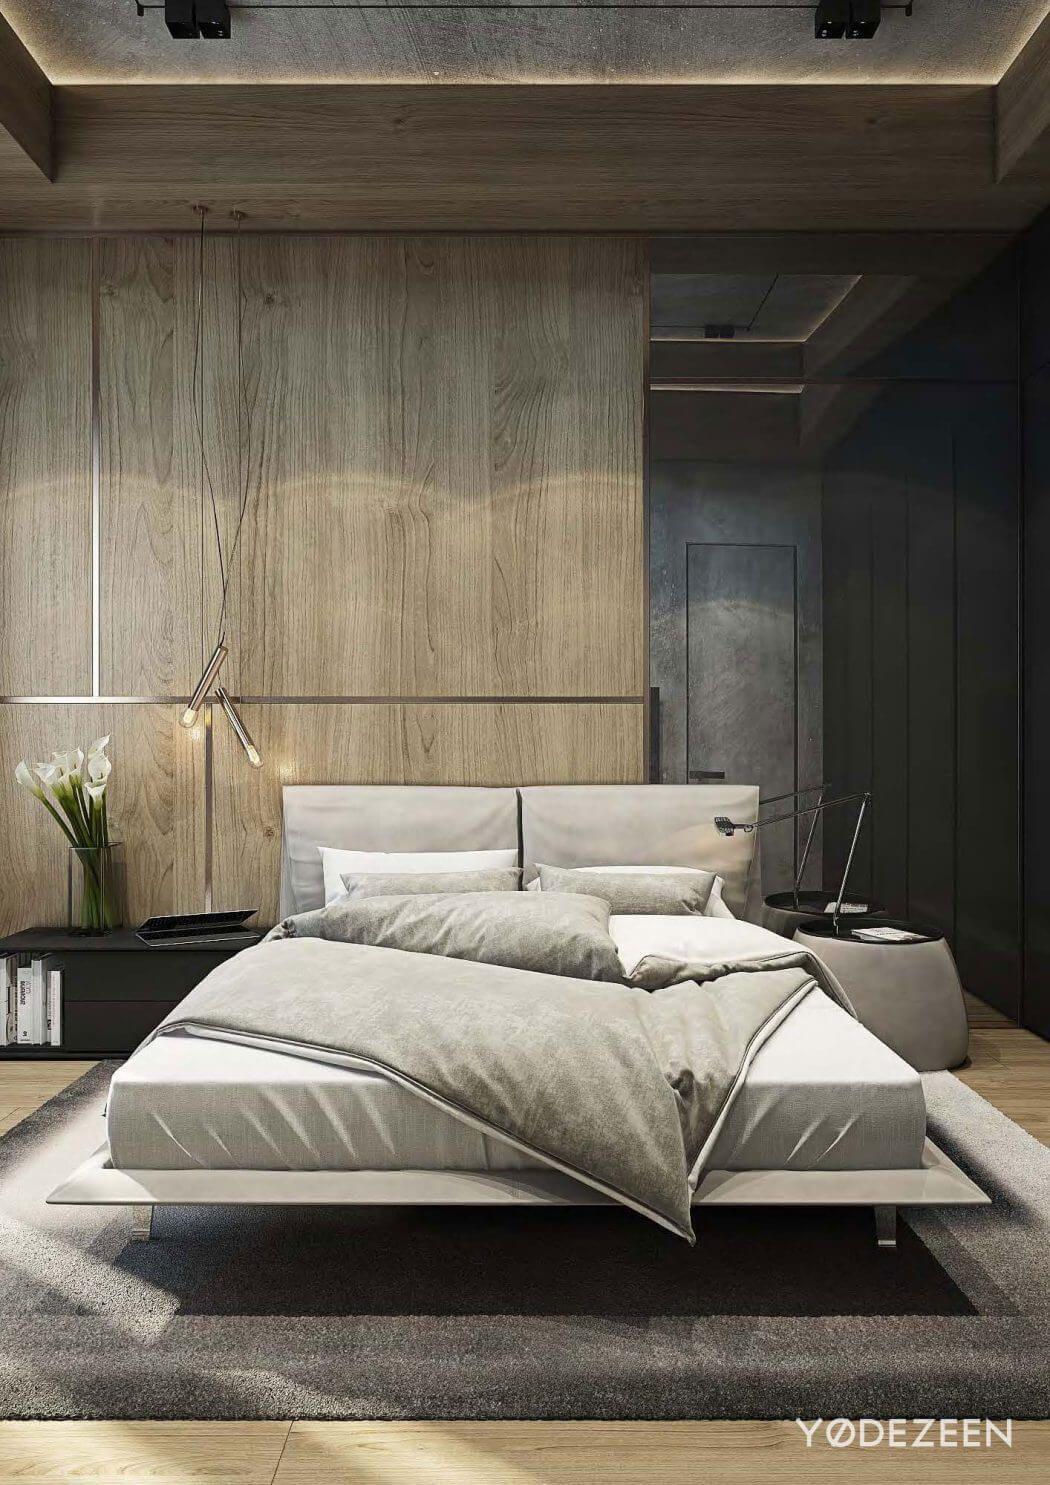 atmosph re sombre tbilisi ai appartement et. Black Bedroom Furniture Sets. Home Design Ideas